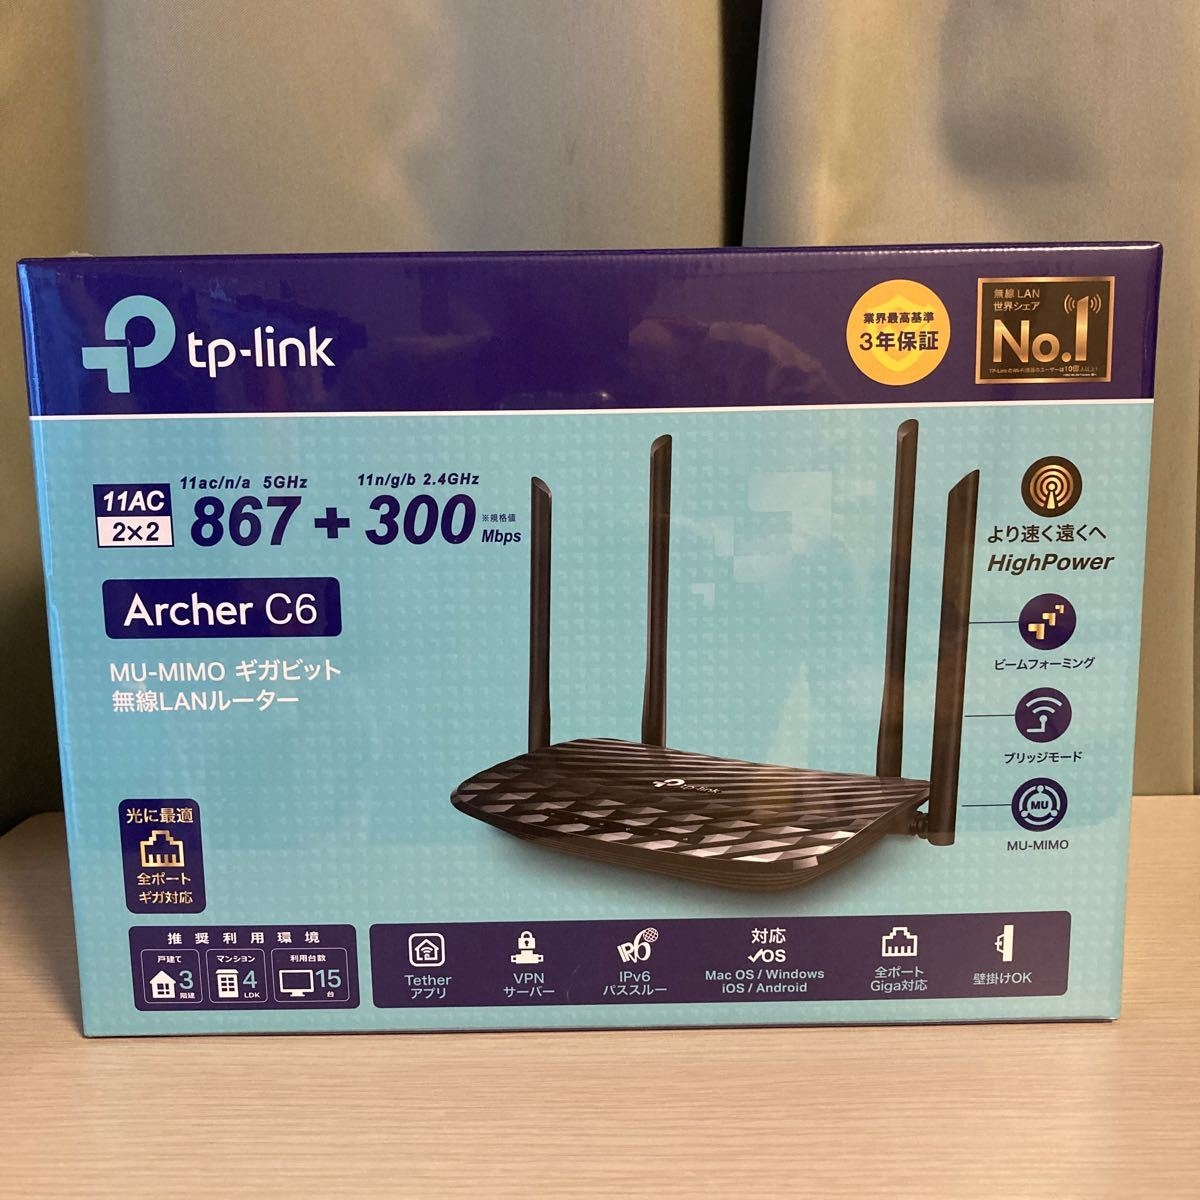 Wi-Fiルーター 無線Lanルータ 867+300Mbps Archer C6 11ac/nデュアルバンド親機 全ポートギガ